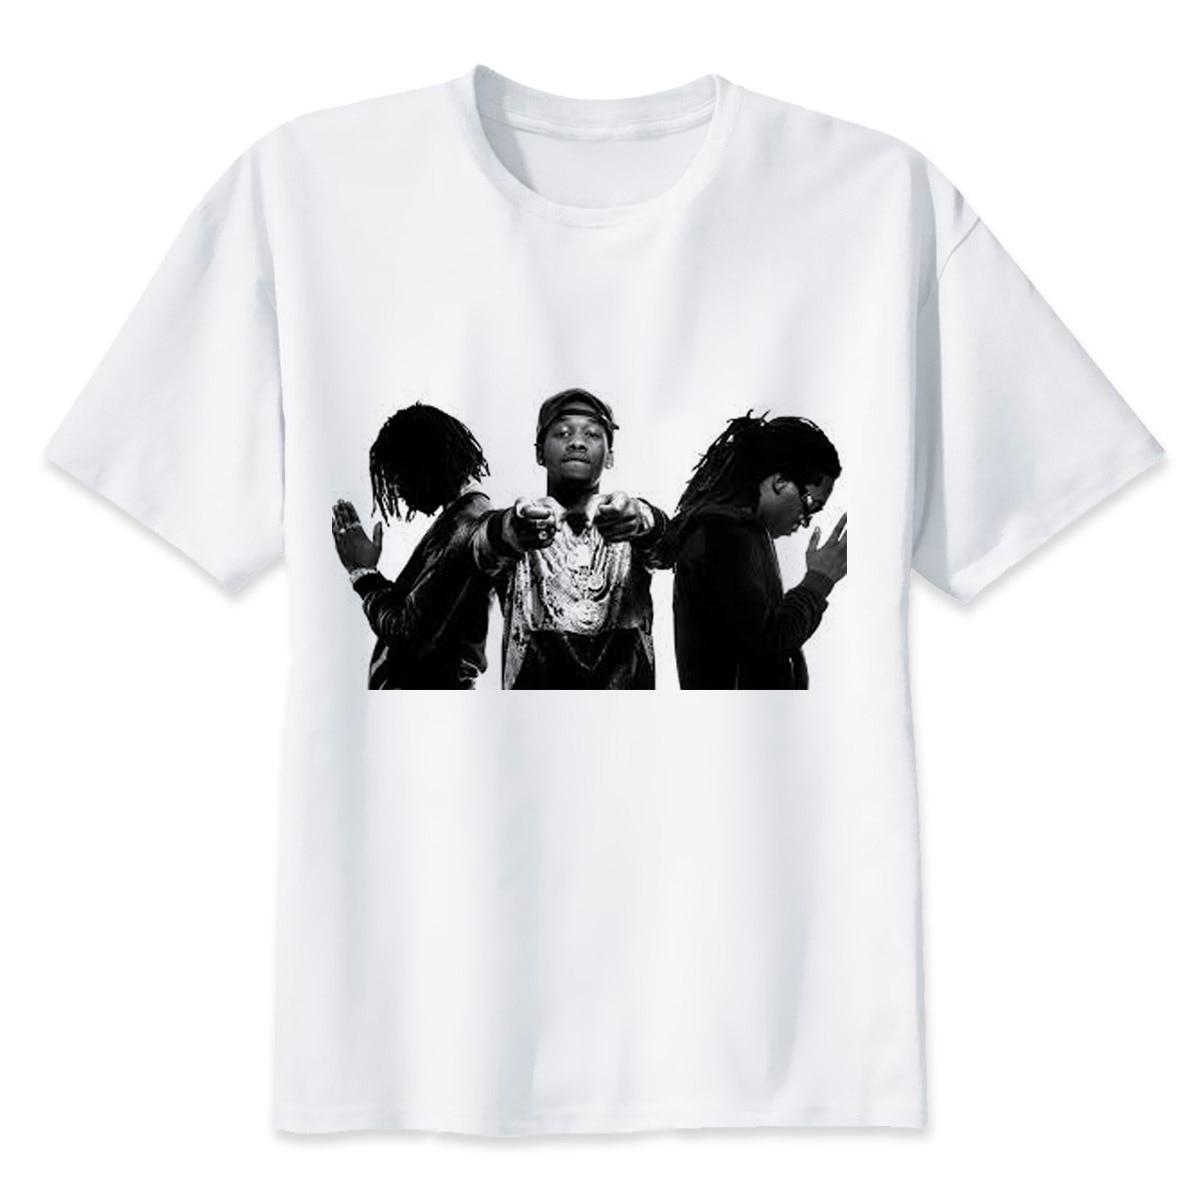 Migos t shirt men men summer fashion high quality t for Best quality mens white t shirts